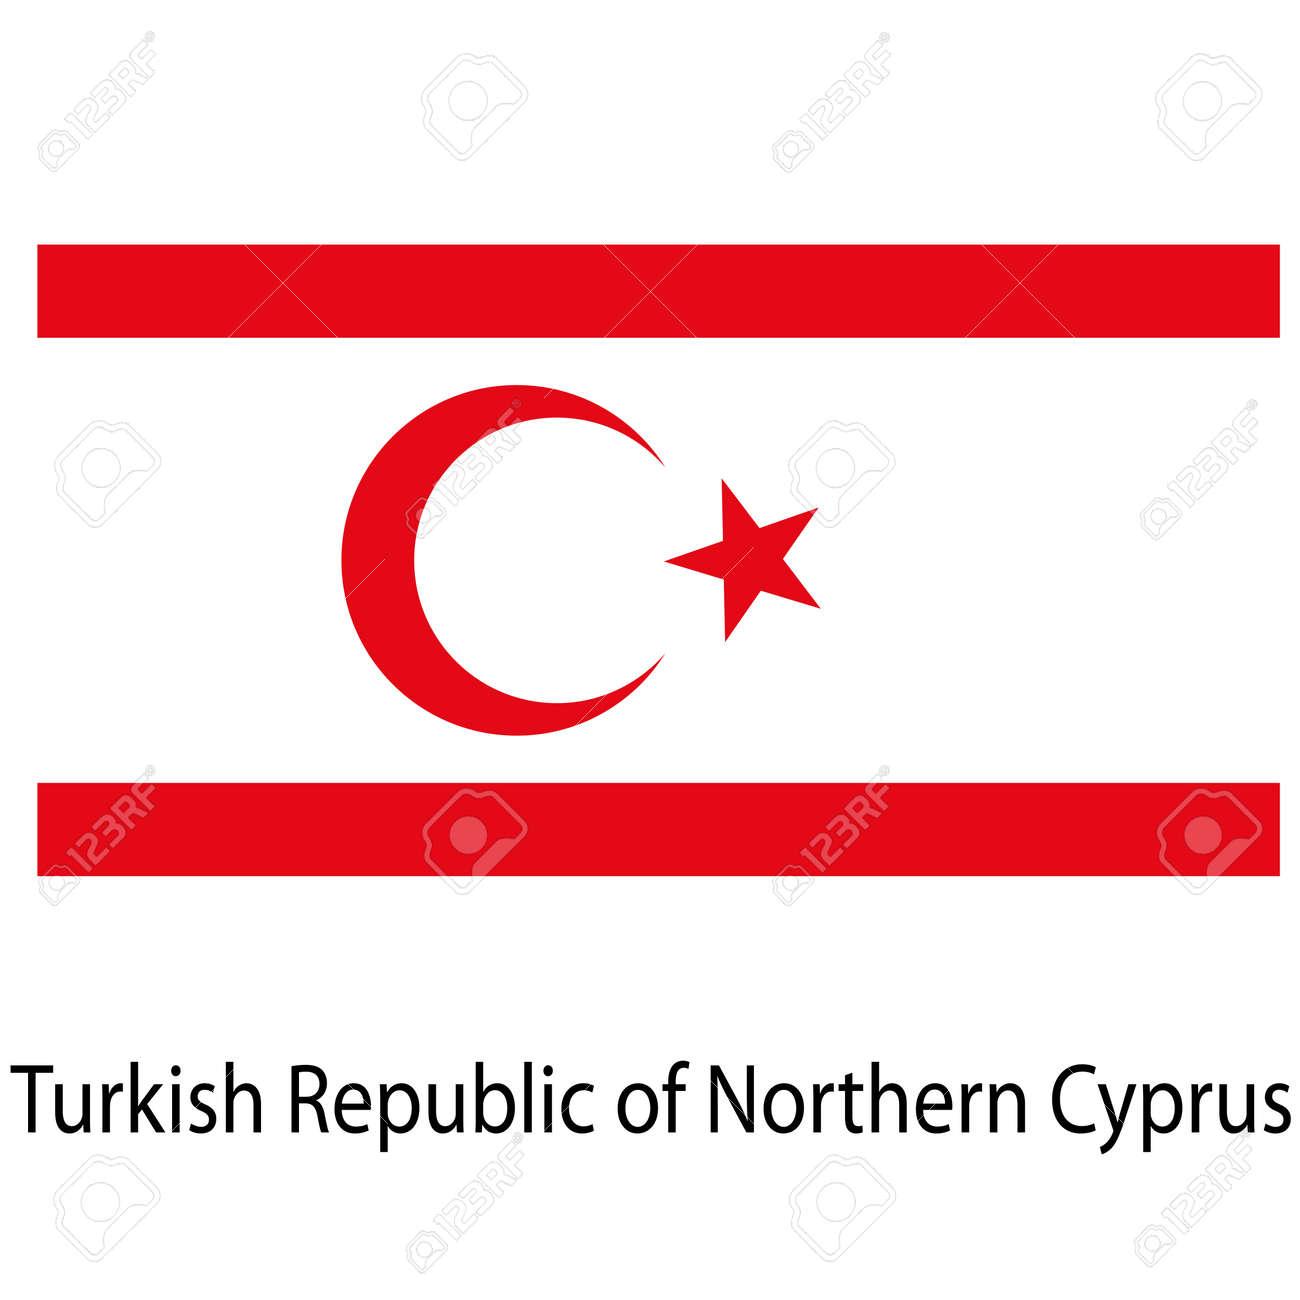 Flagge Des Landes Türkische Republik Nordzypern. Vektor-Illustration ...